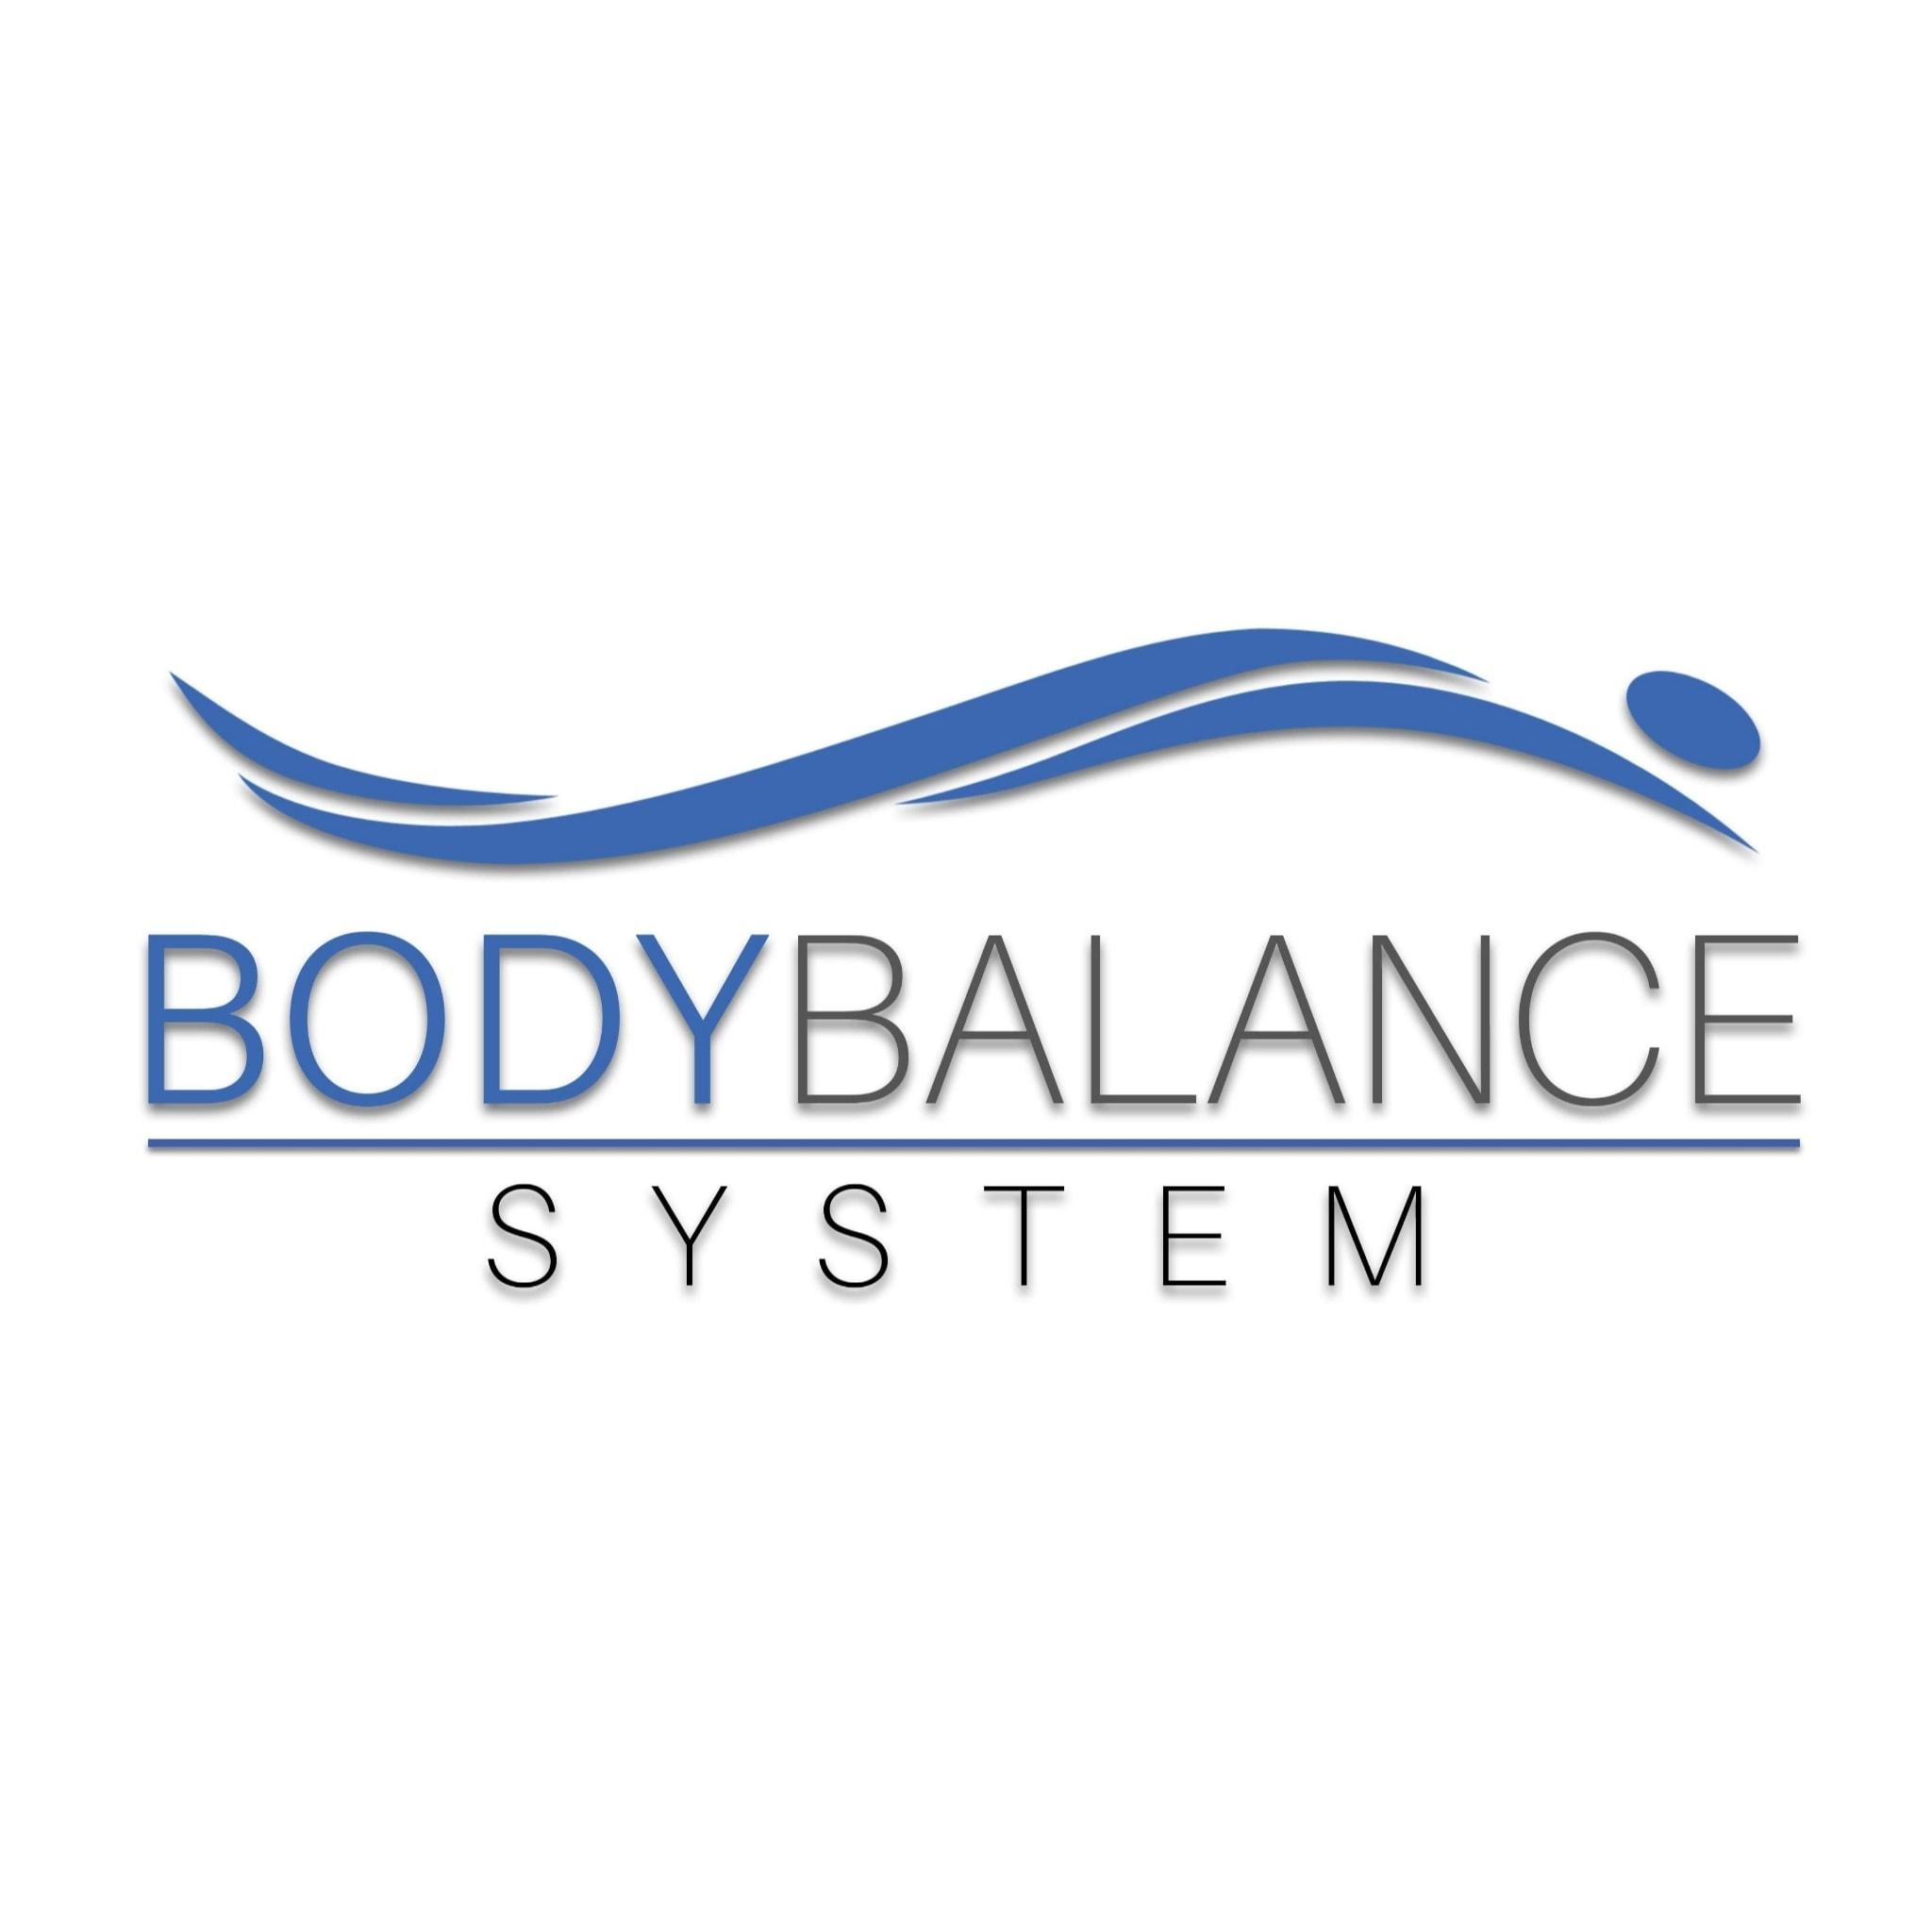 Body Balance System